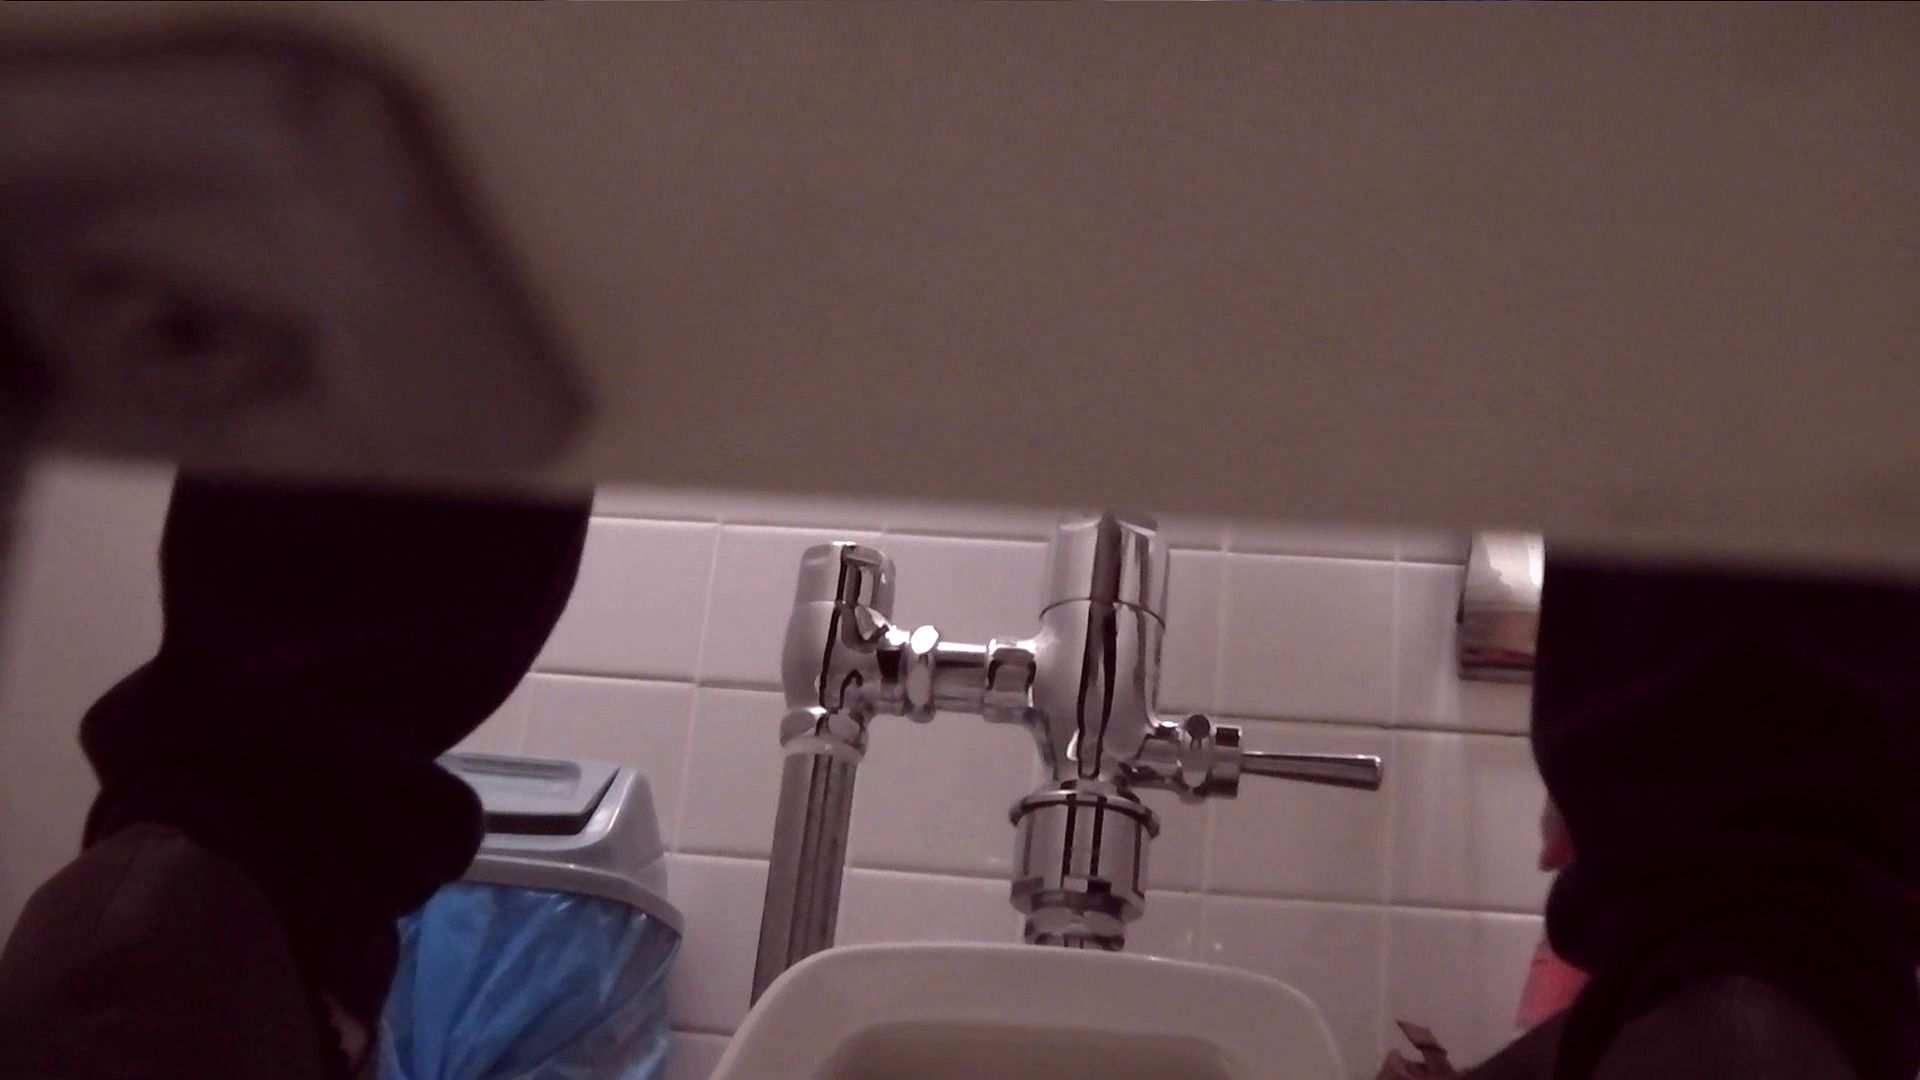 vol.15 命がけ潜伏洗面所! 肌荒れ注意報!! プライベート 隠し撮りすけべAV動画紹介 102画像 95